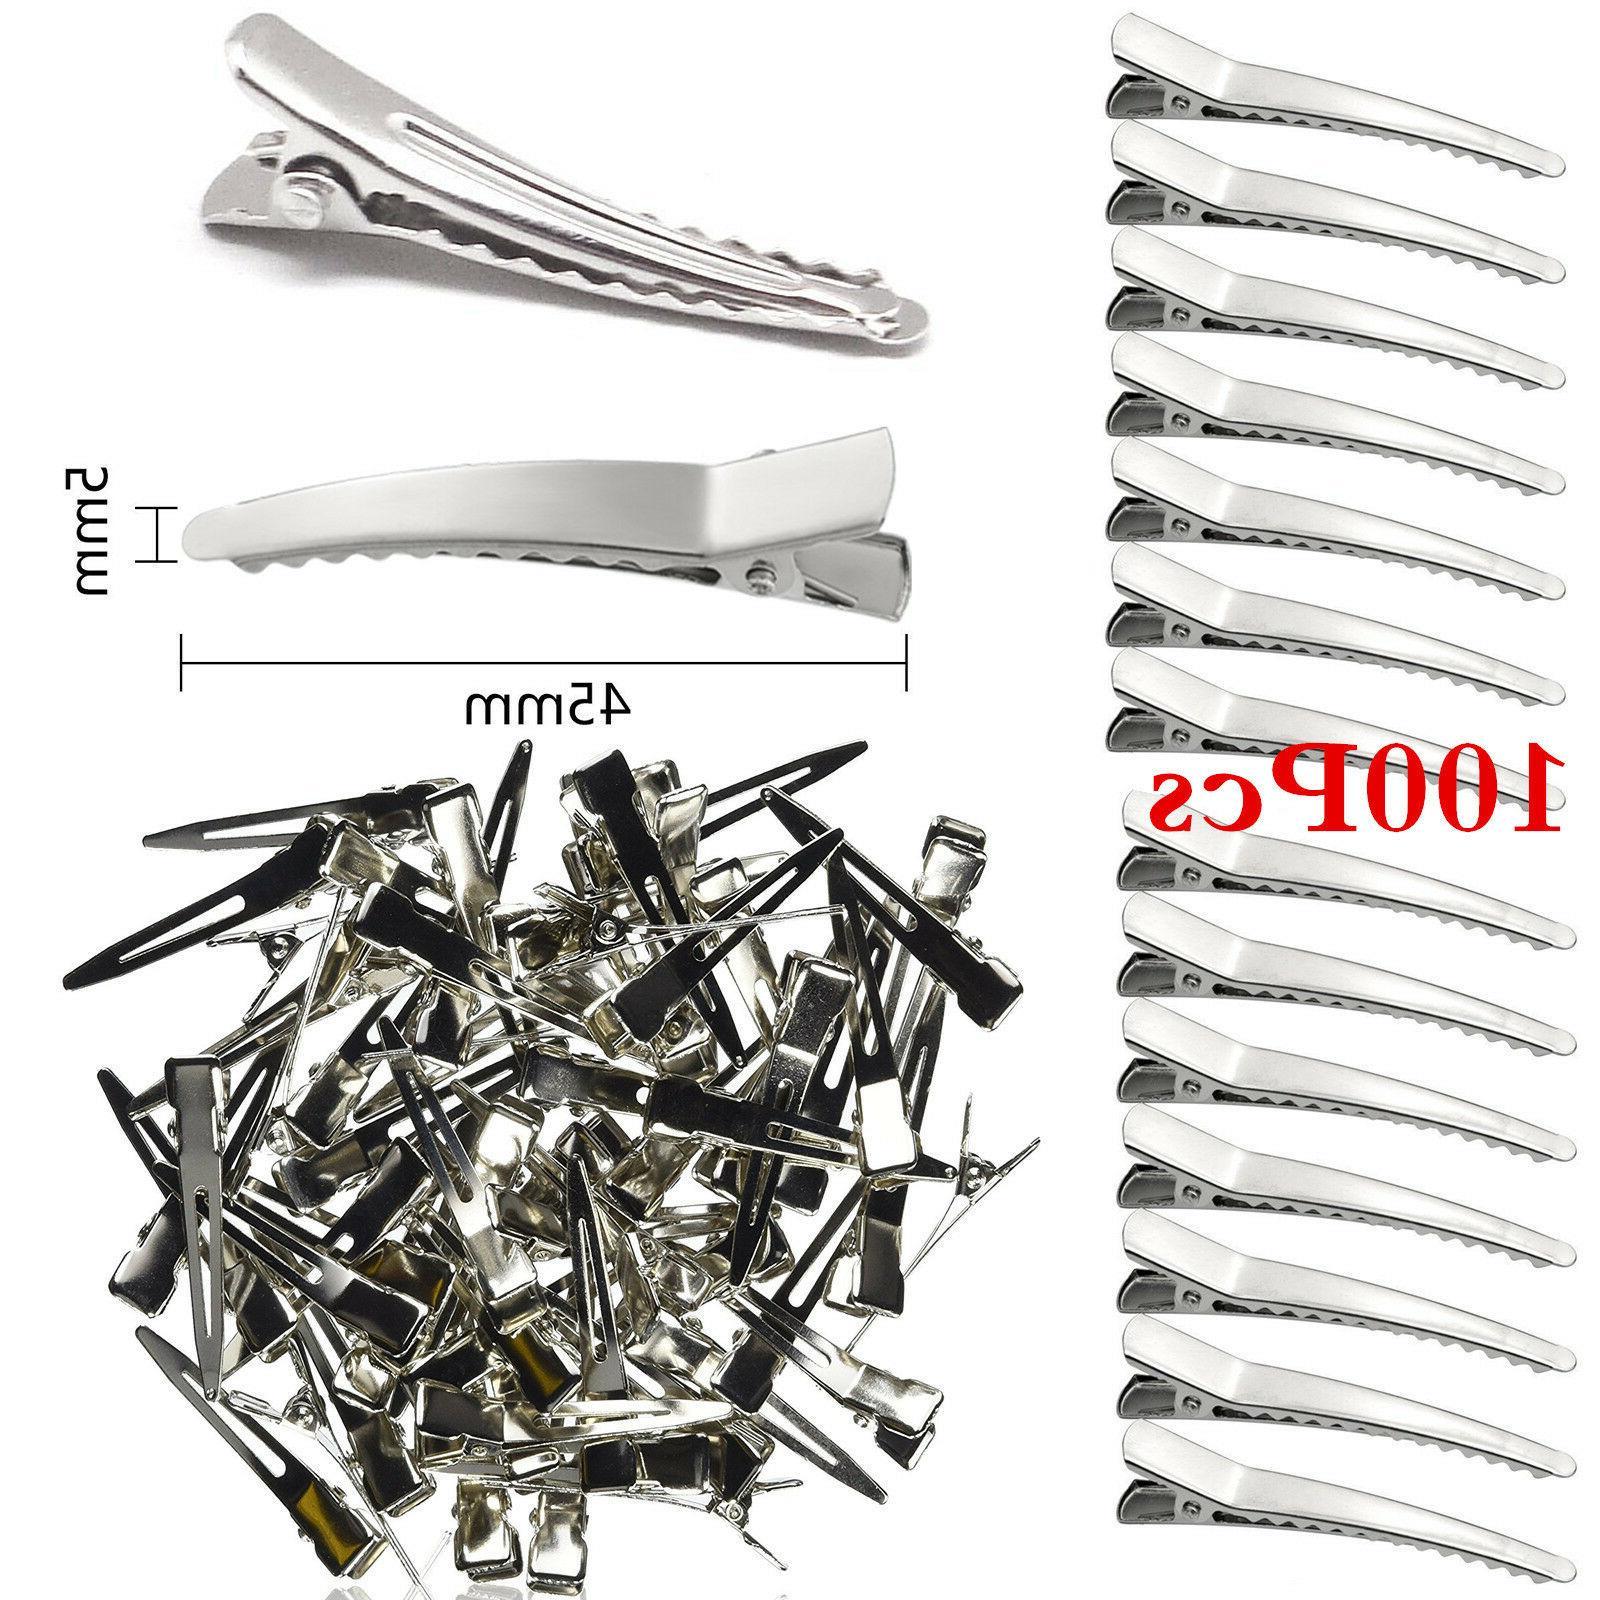 Bulk 100 Pcs 45mm Curved Alligator Hair Clips Silver Metal C